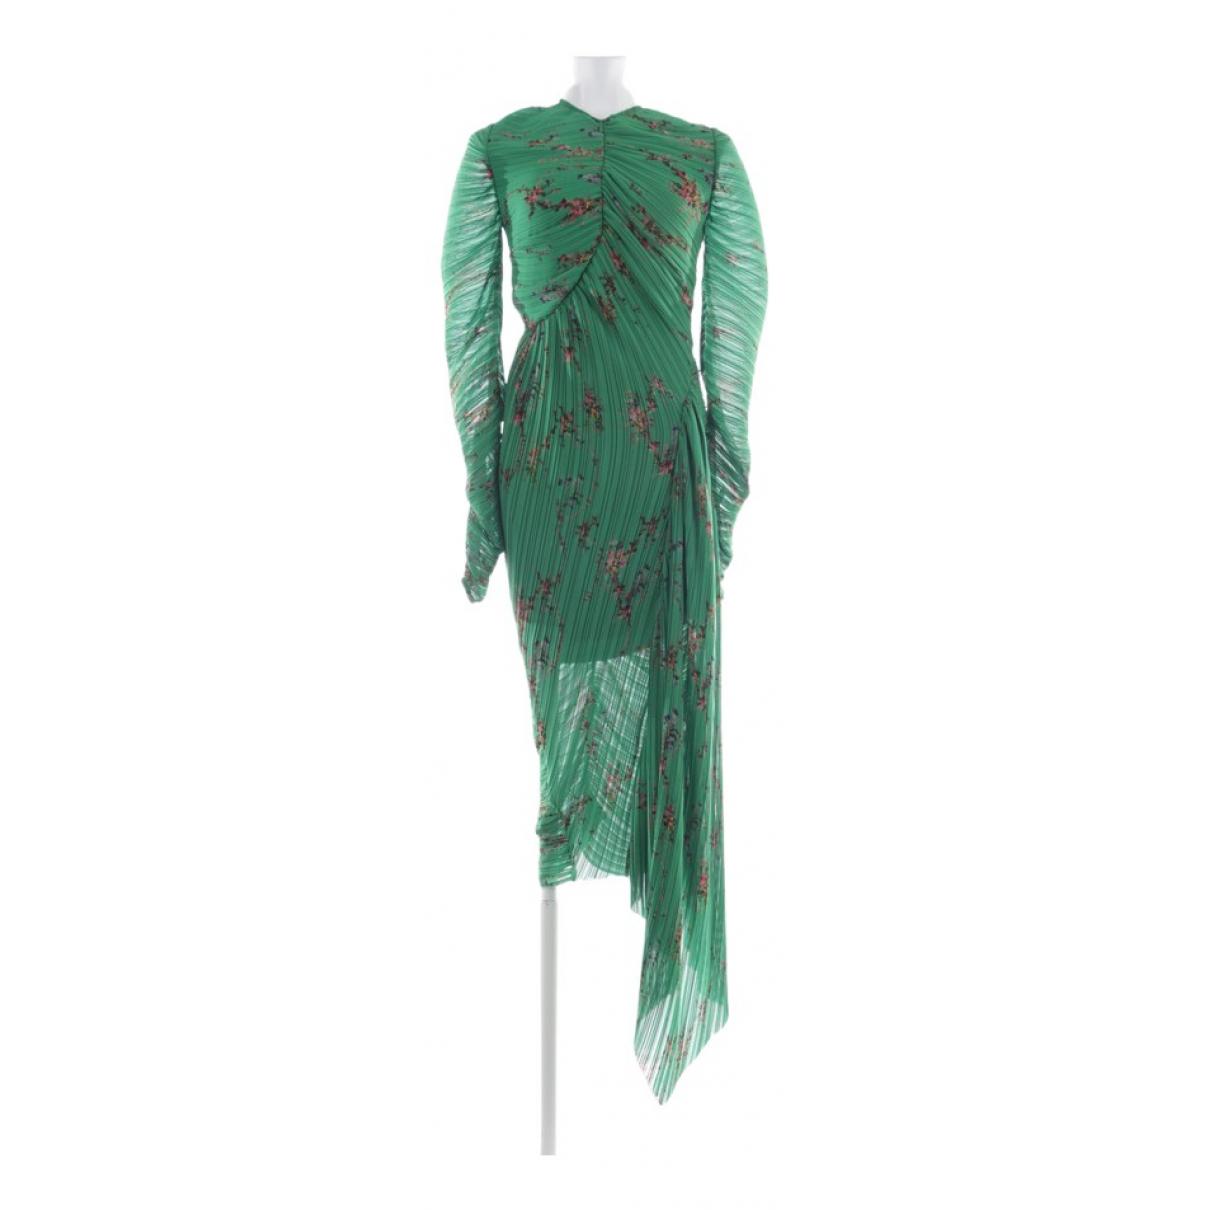 Preen By Thornton Bregazzi \N Green dress for Women 36 FR